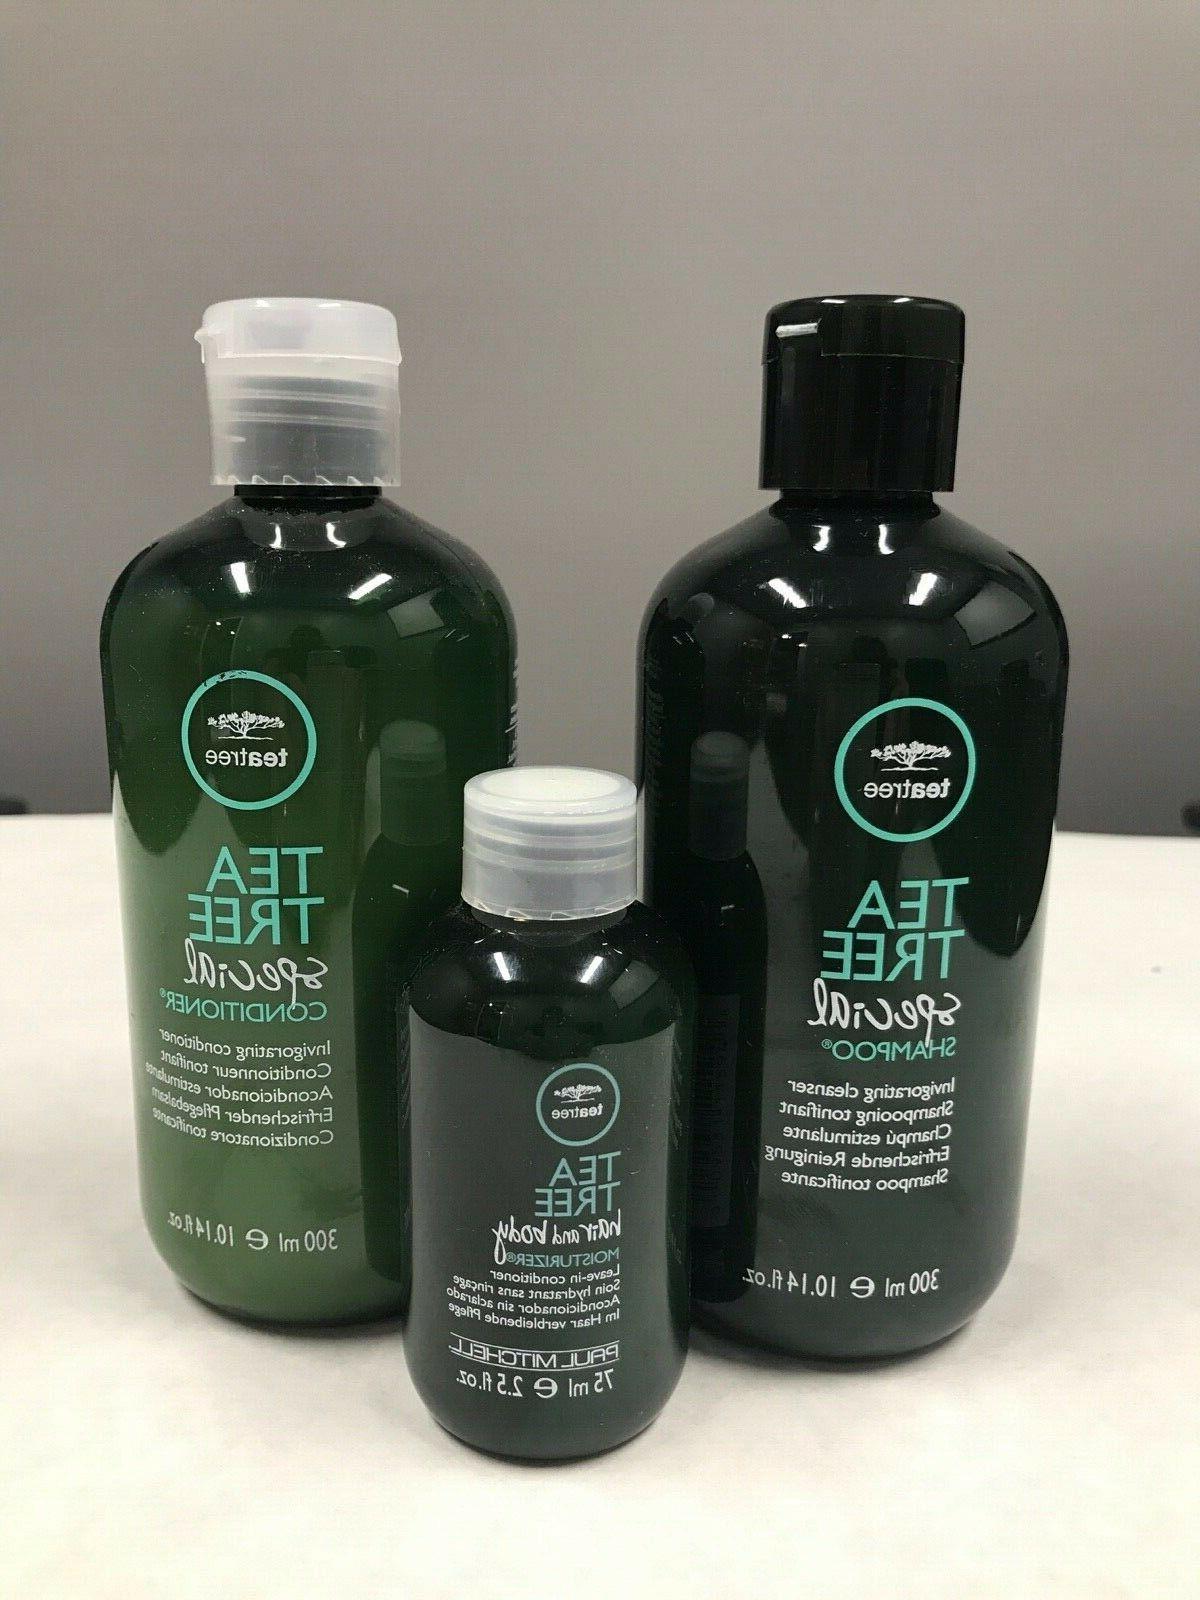 tea tree special shampoo and conditioner oz